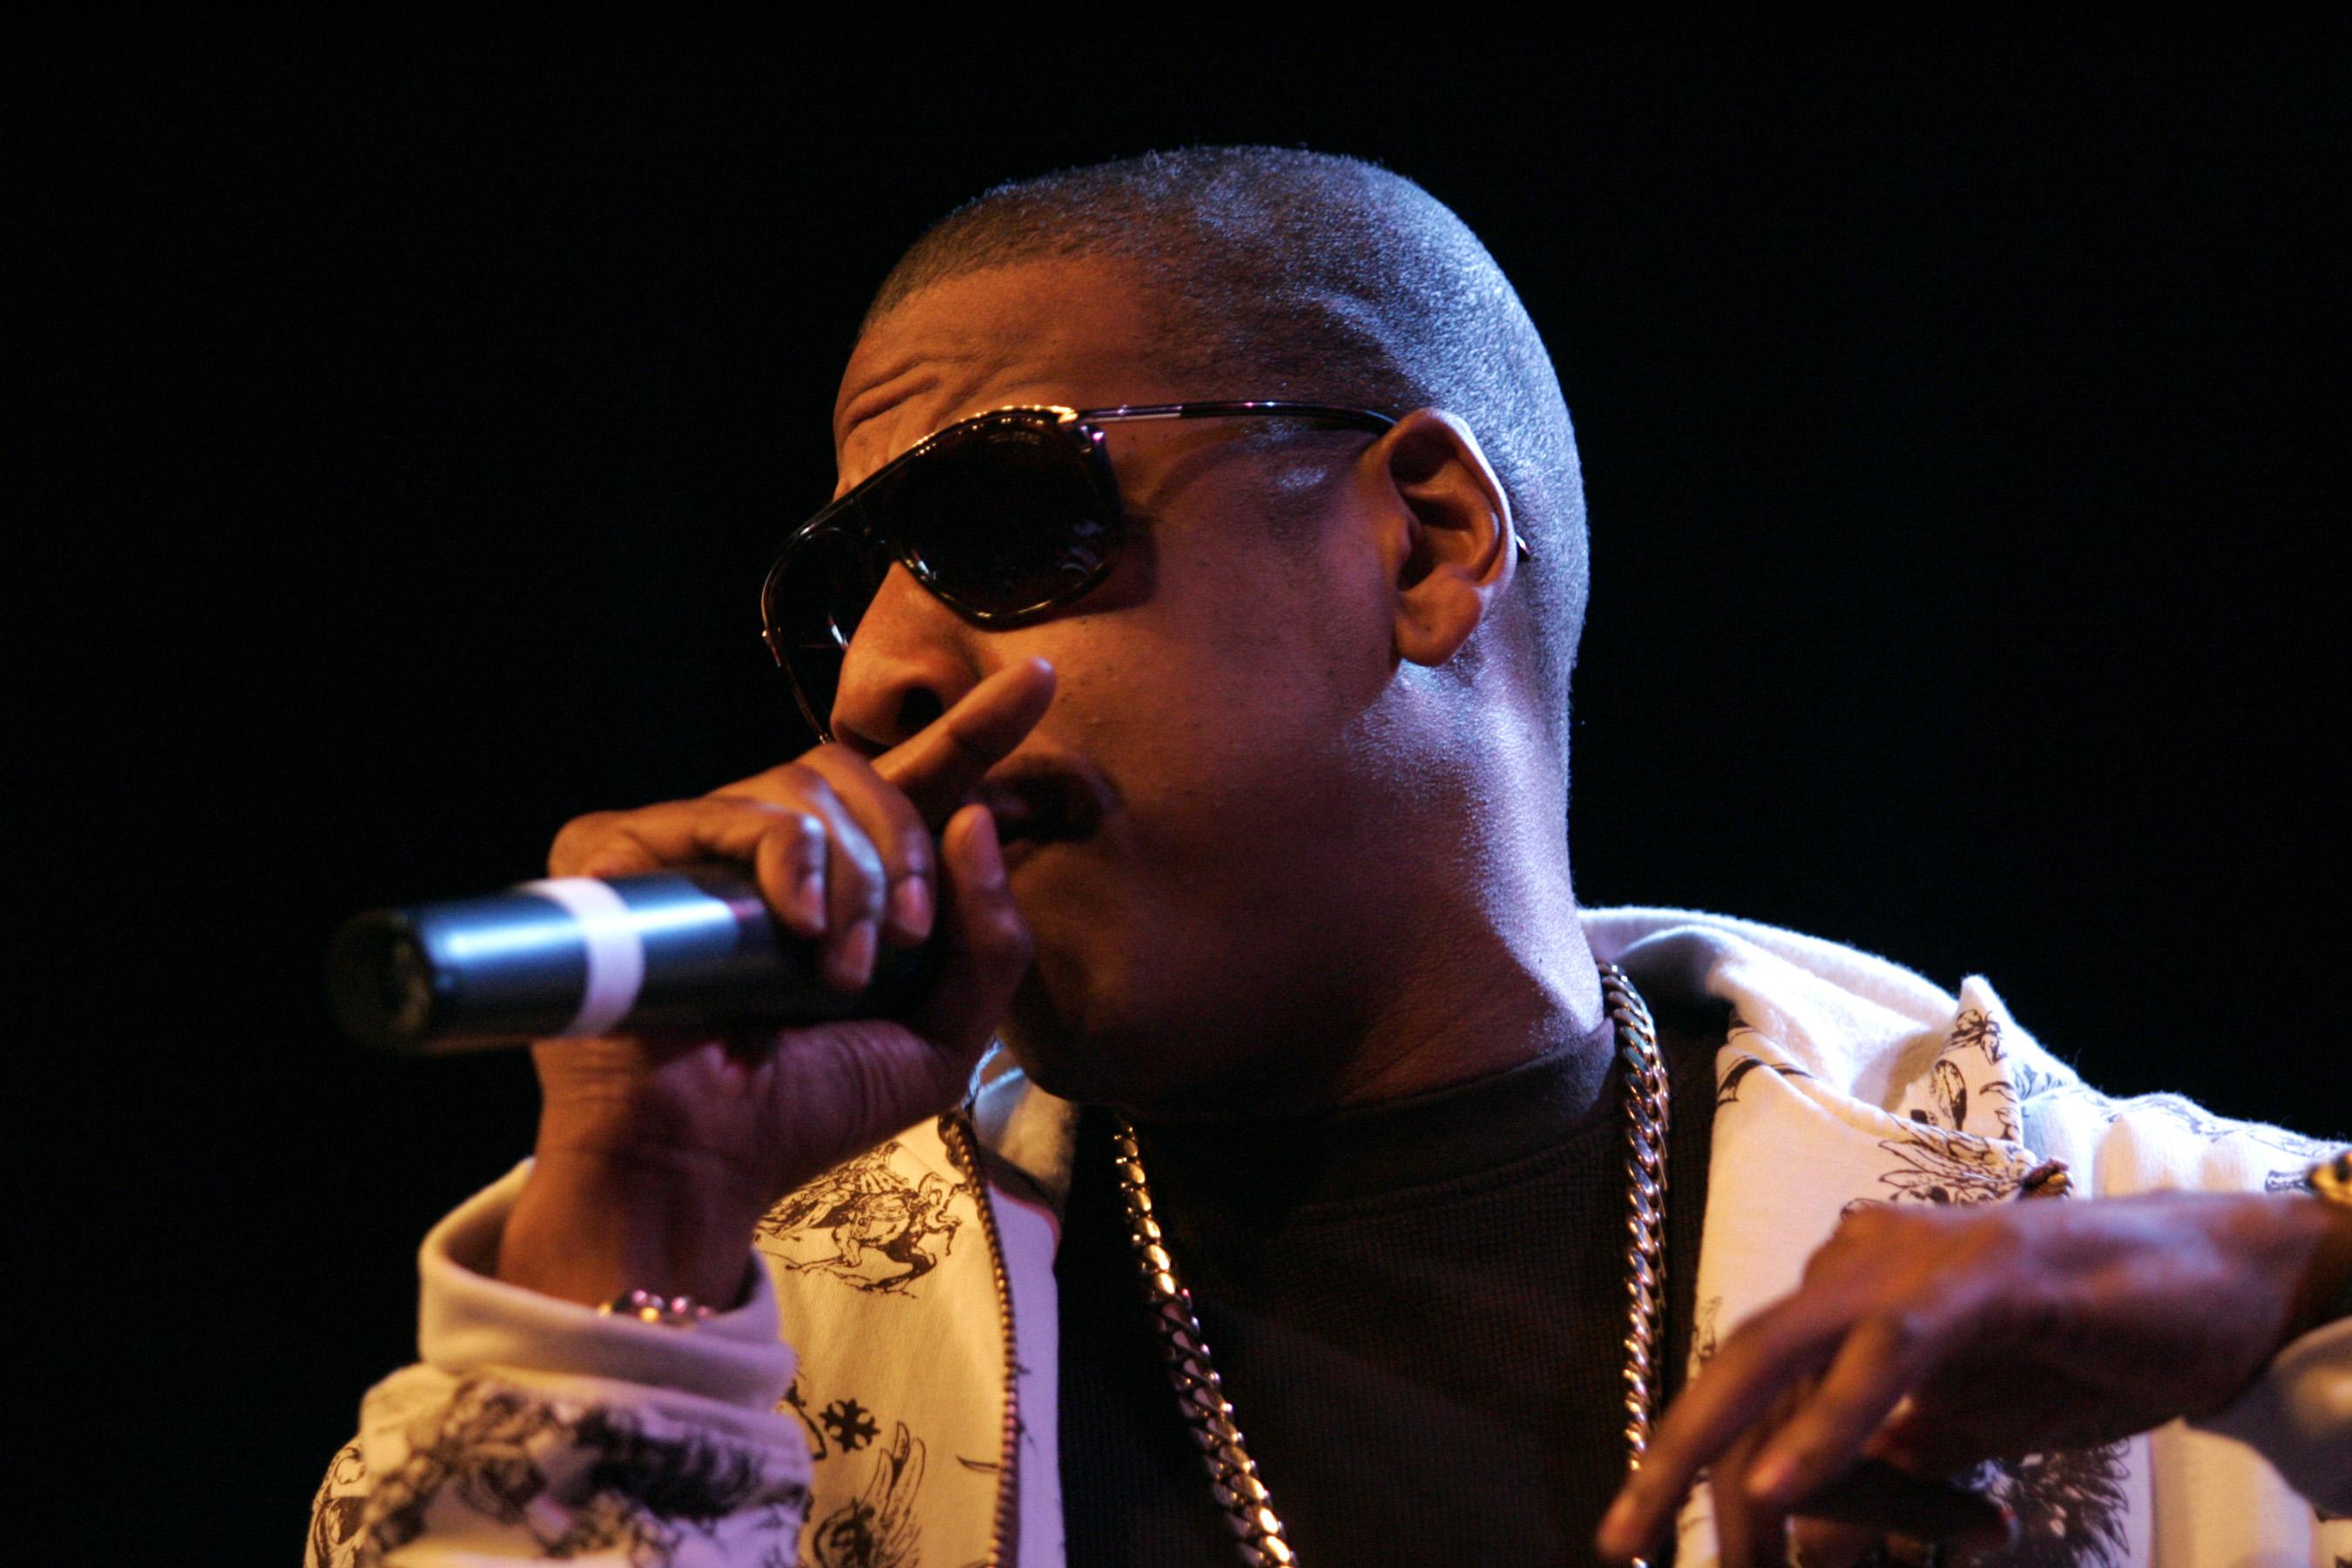 Jay-Z 'Hangar Tour' - Atlanta - November 18, 2006